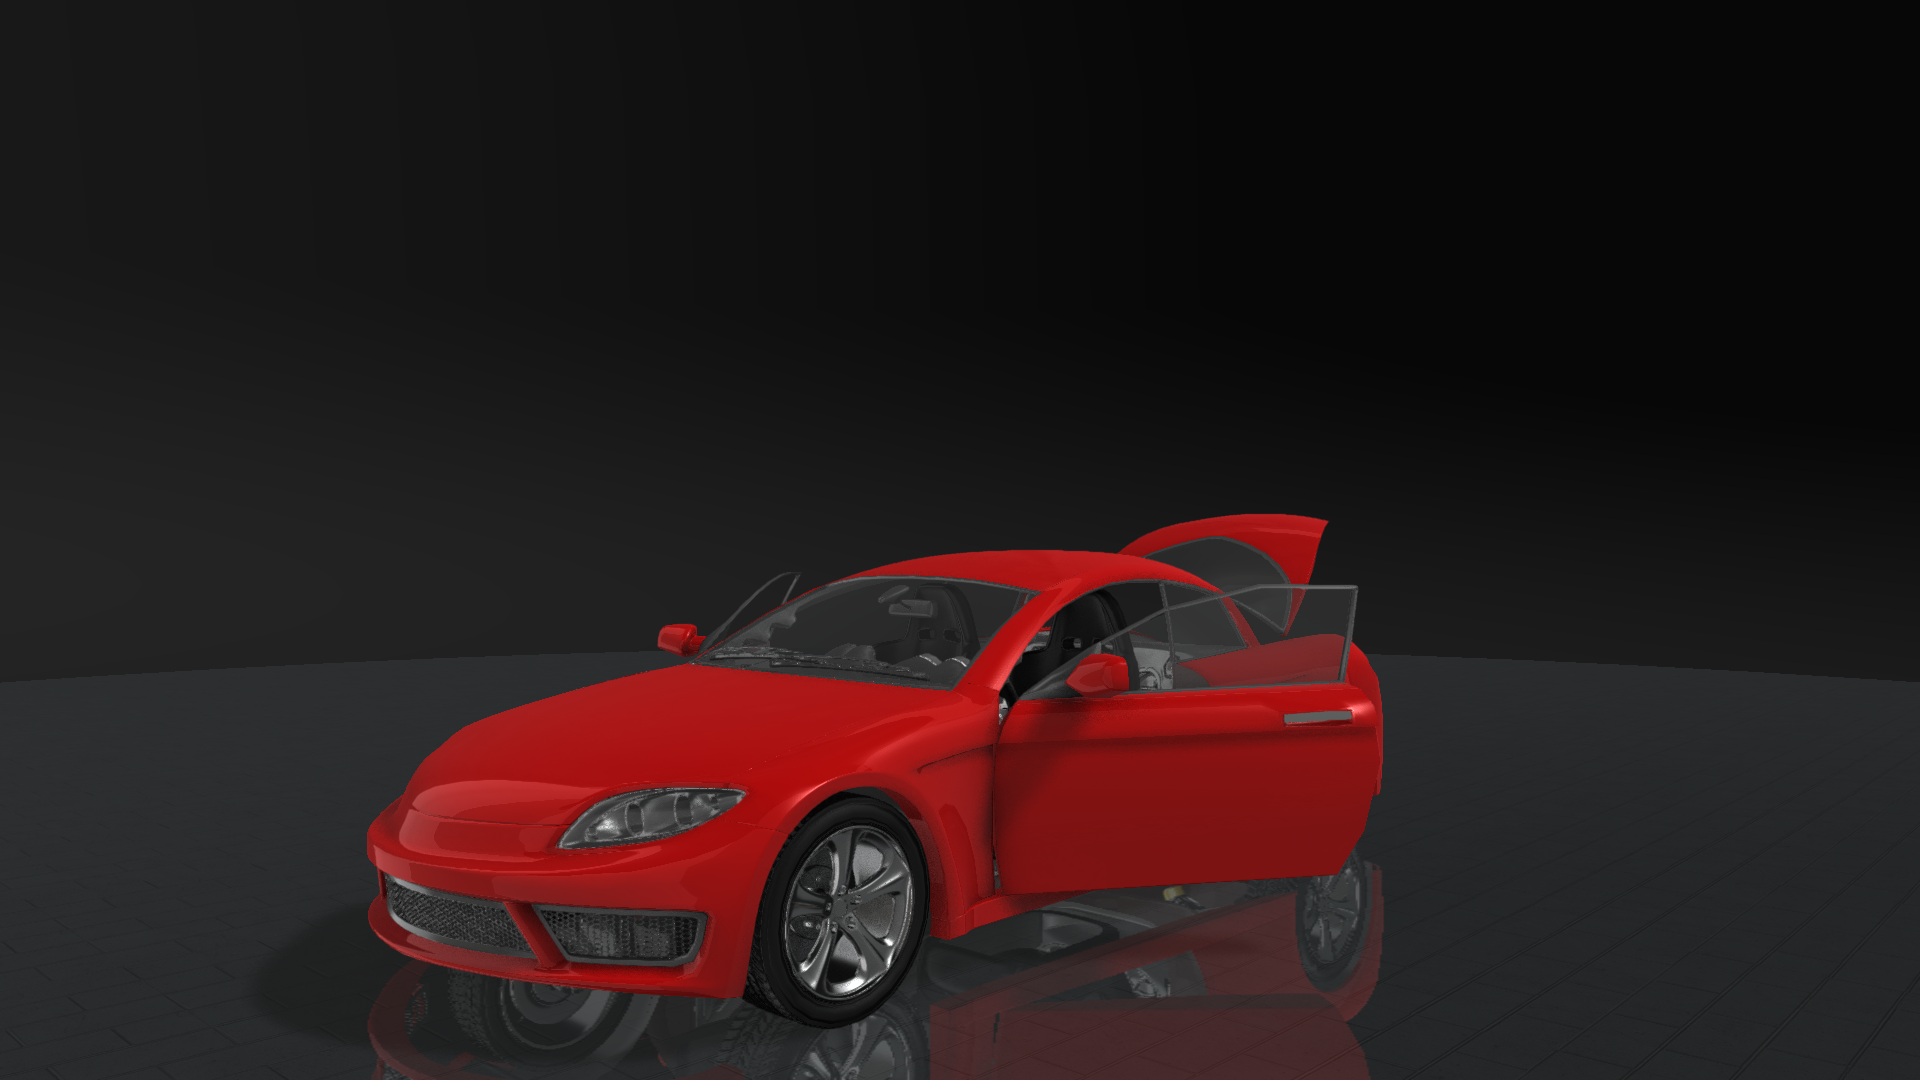 P11-Car_1920x1080_2015-03-16_09-21-03